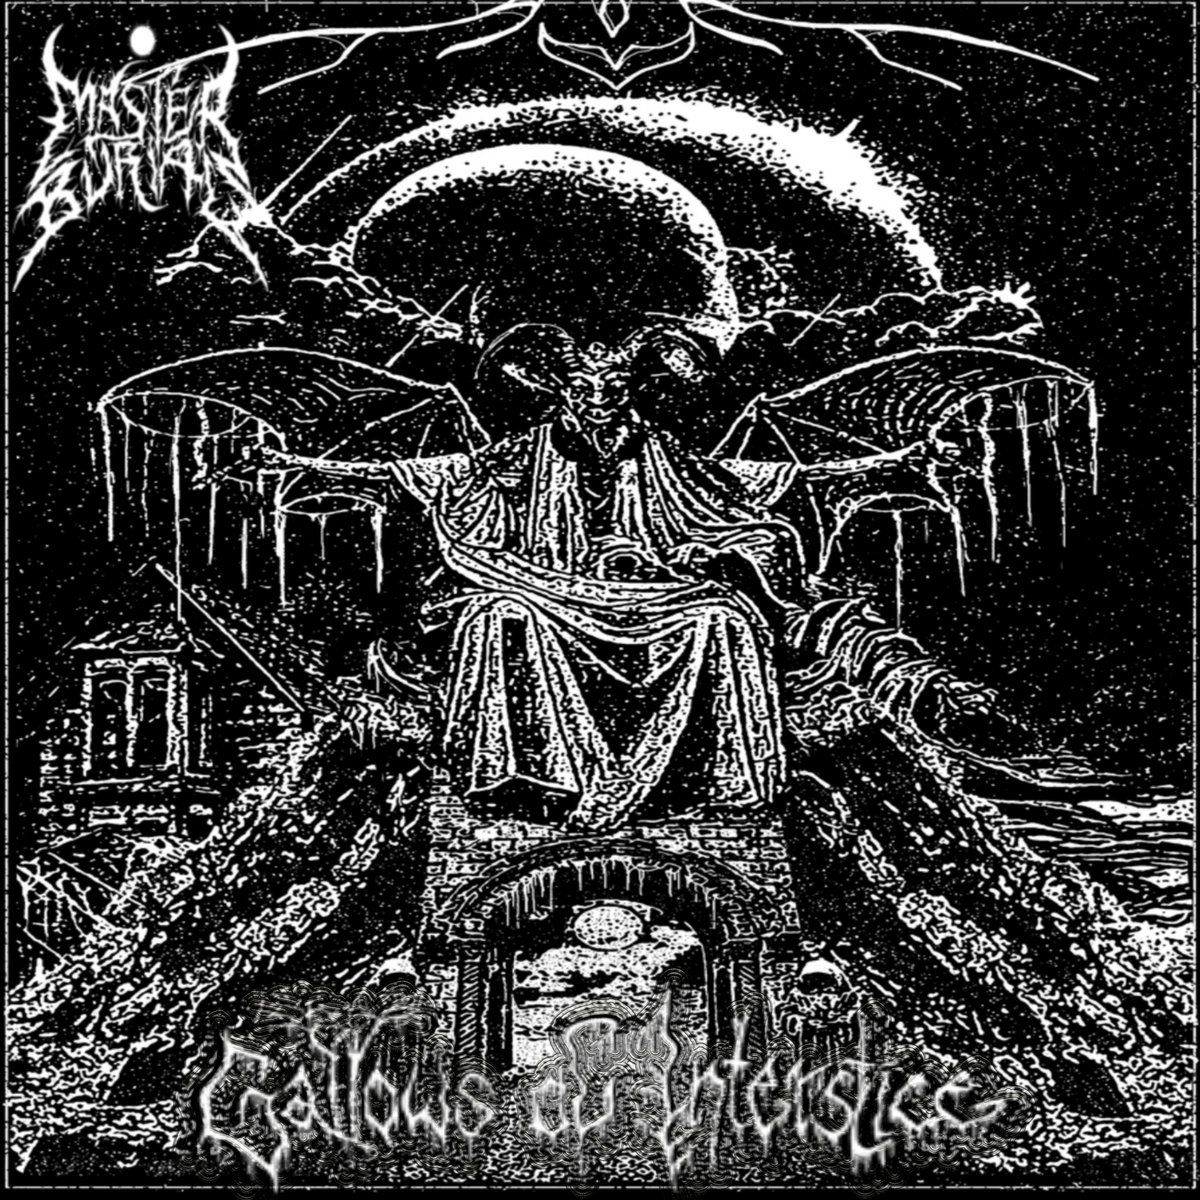 Master Burial - Gallows ov Interstice